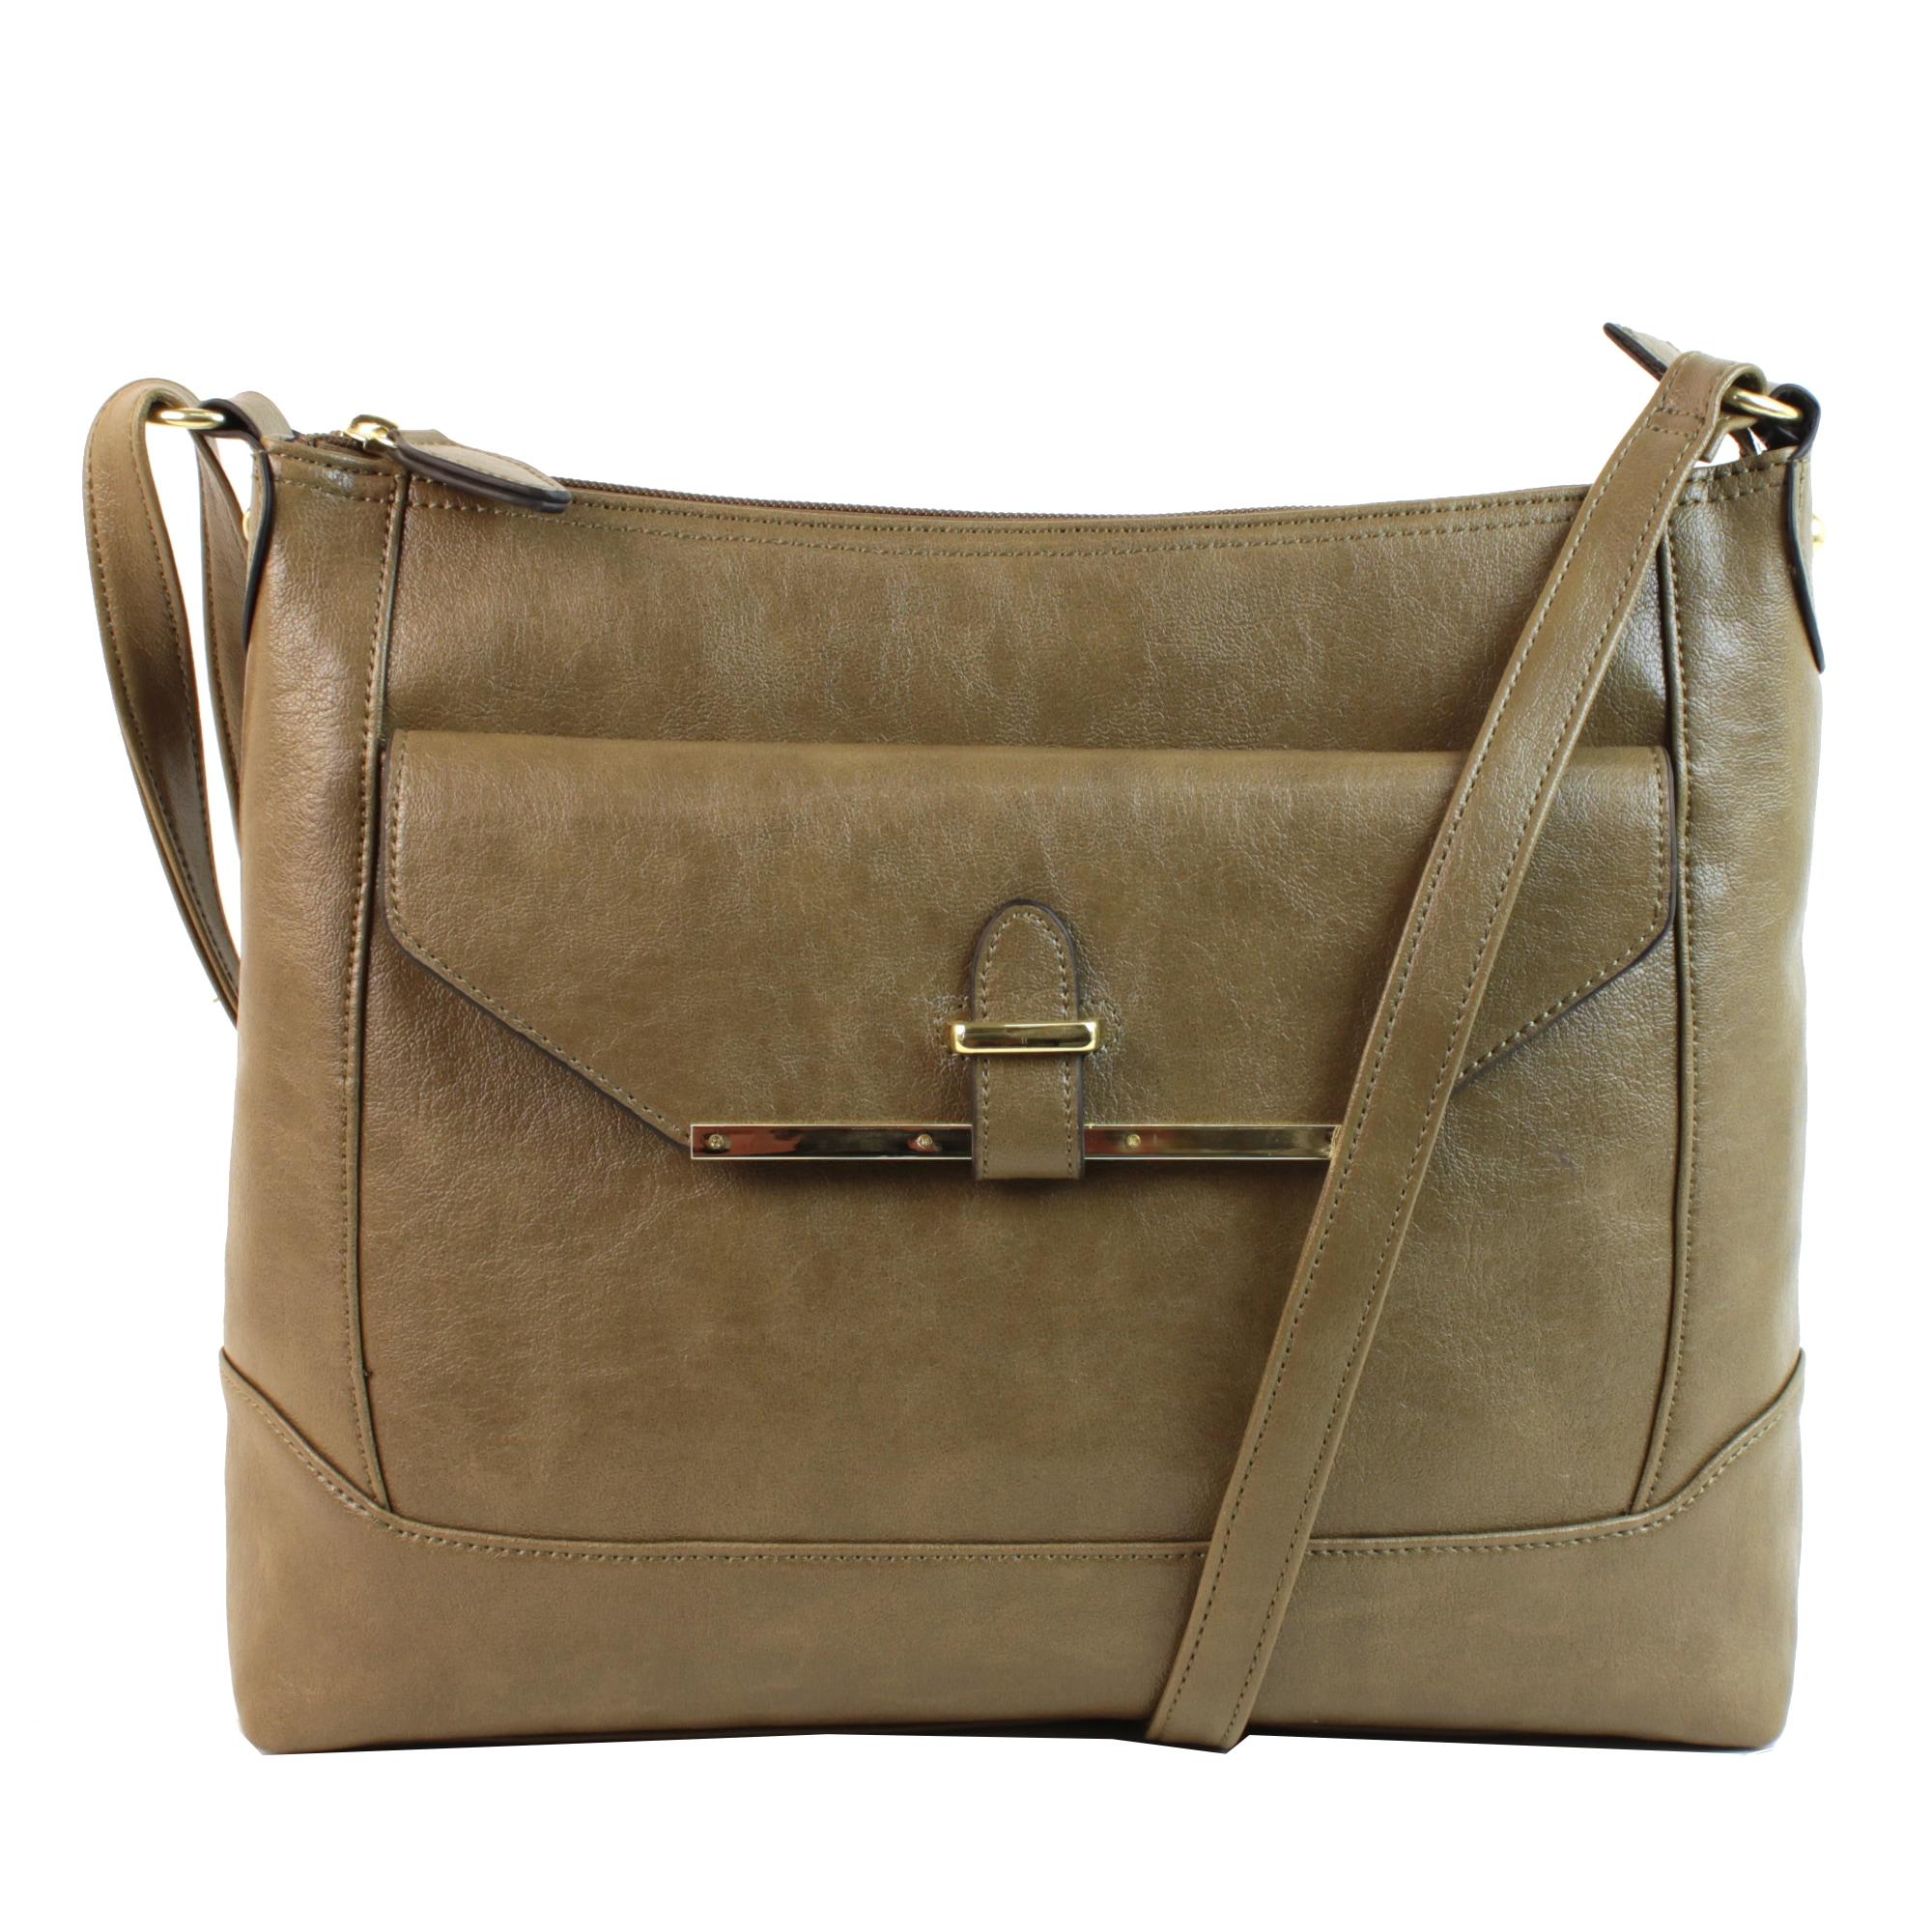 Mondani Emilie M. Charli Top-zipper Hobo Bag